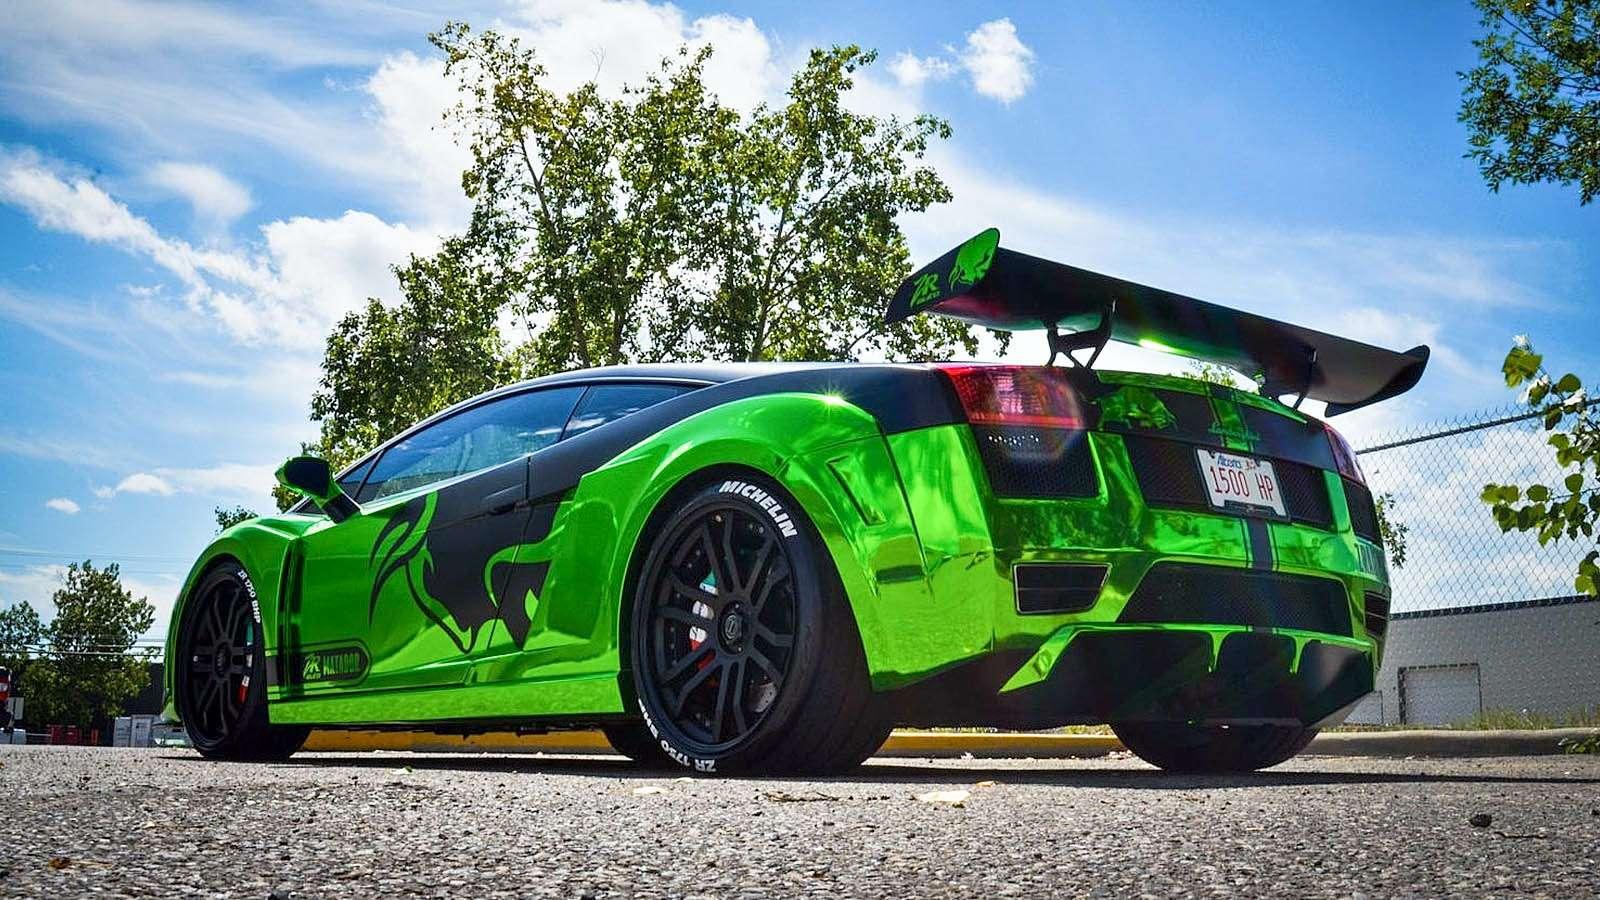 Cуперкар Lamborghini Gallardo отHeffner Performance